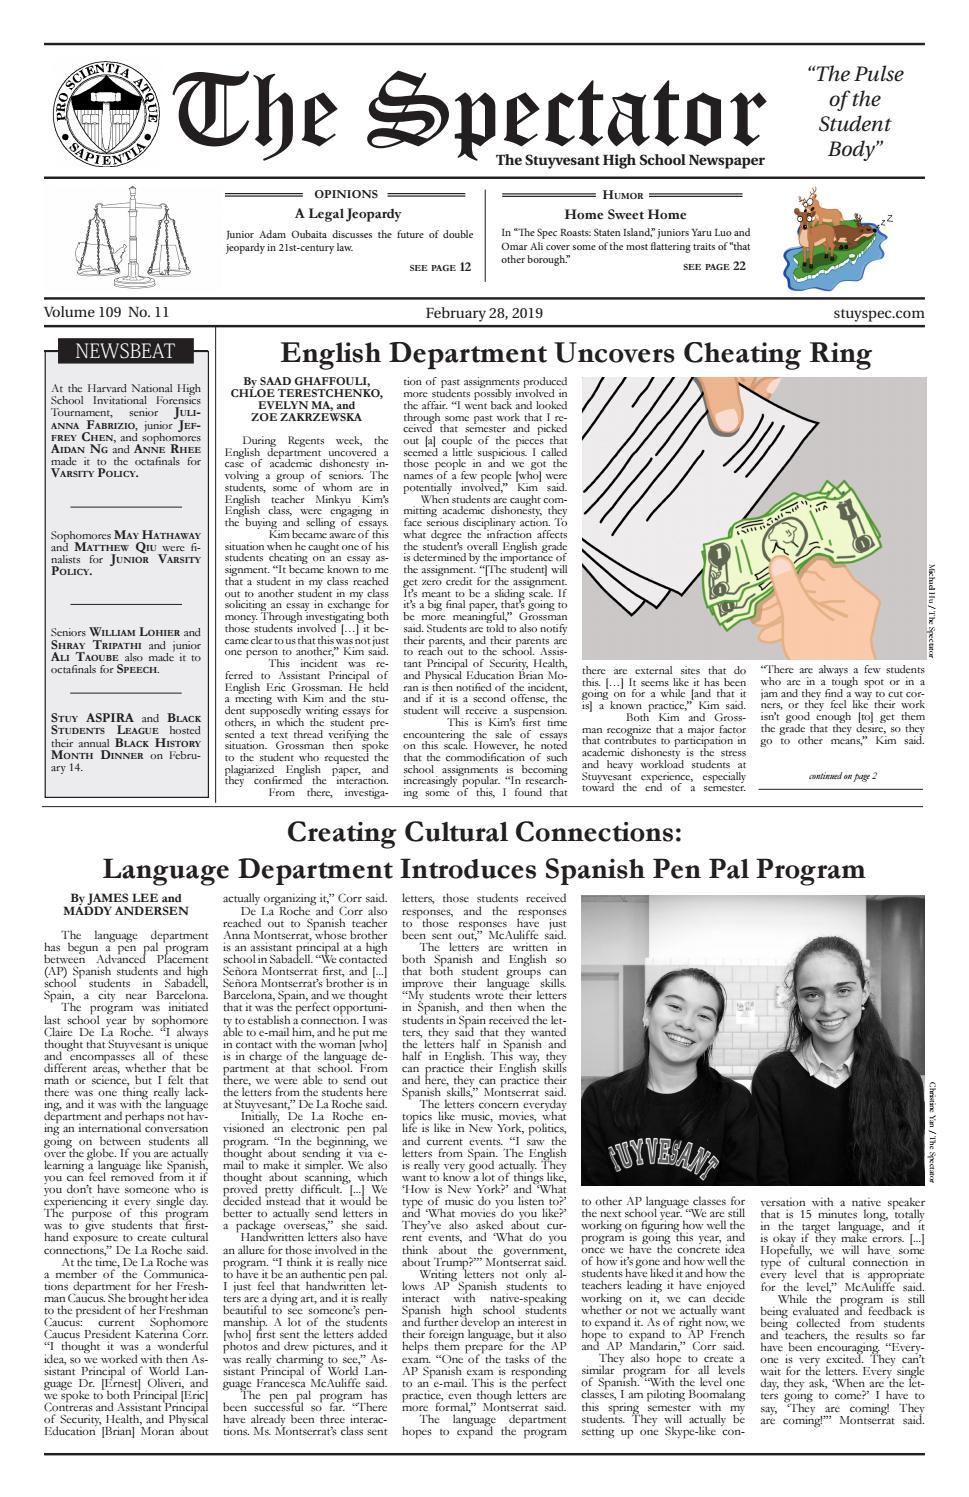 Volume 109, Issue 11 by The Stuyvesant Spectator - issuu